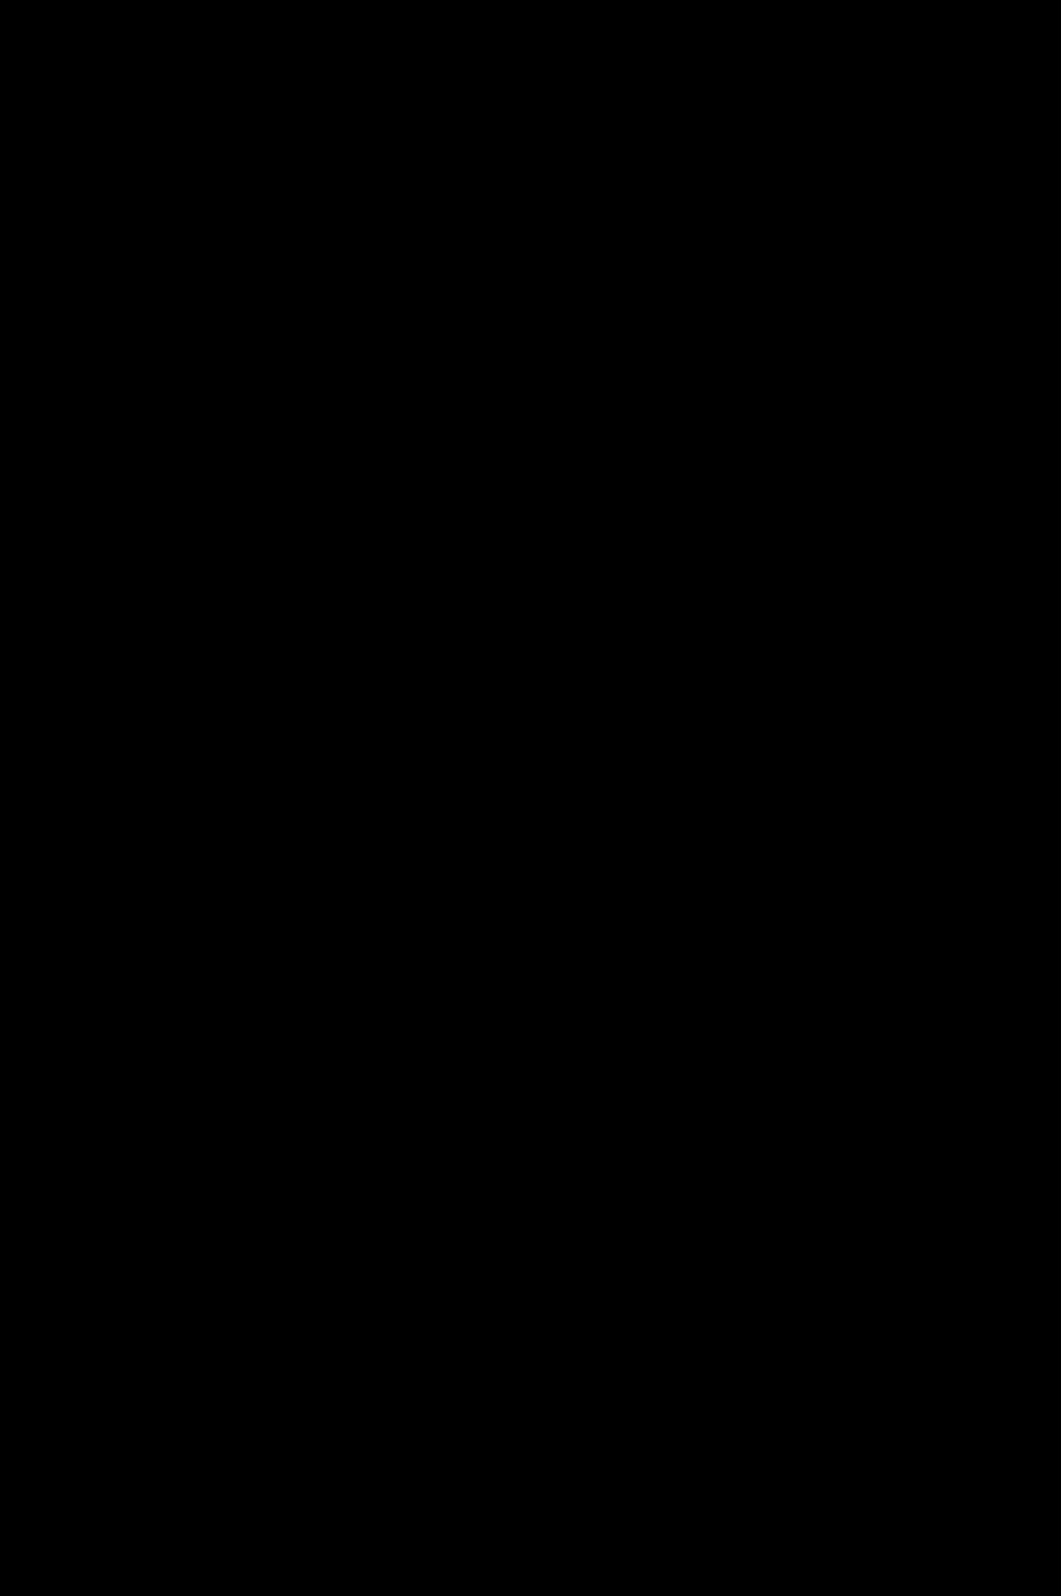 a31硬笔书法竖式横写稿纸图片